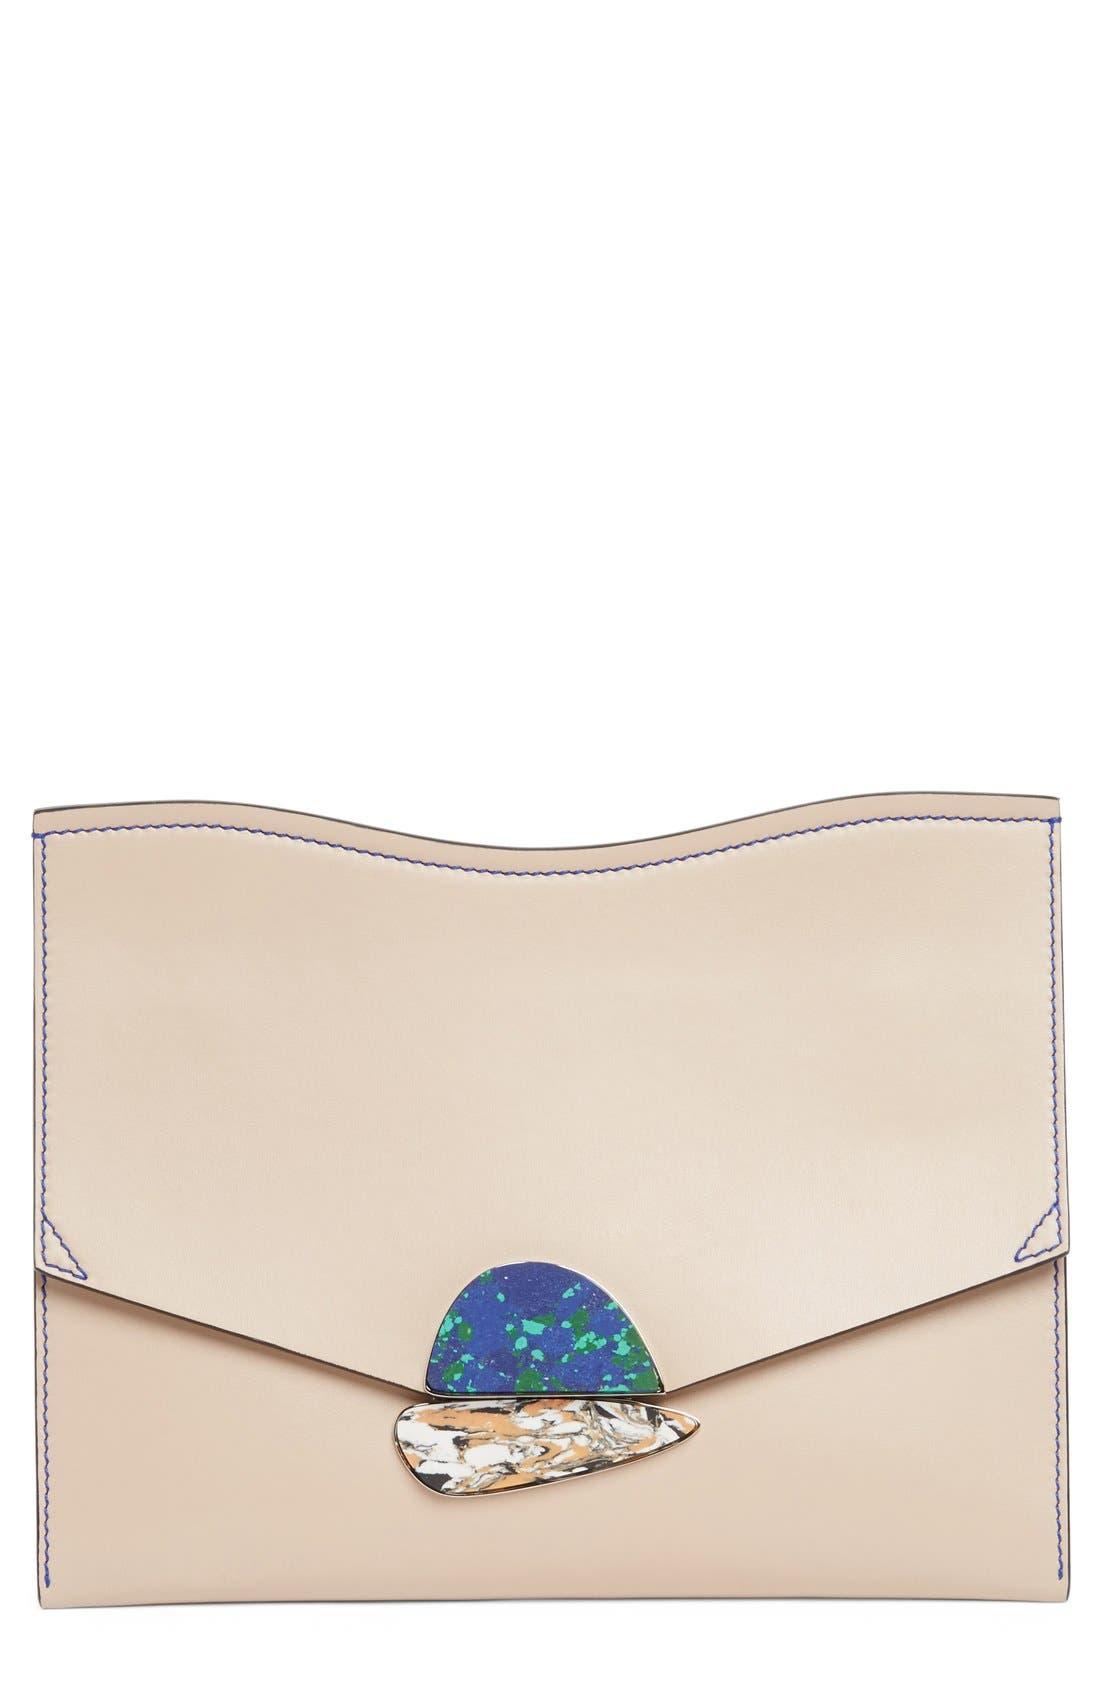 Medium Calfskin Leather Clutch,                             Main thumbnail 1, color,                             250